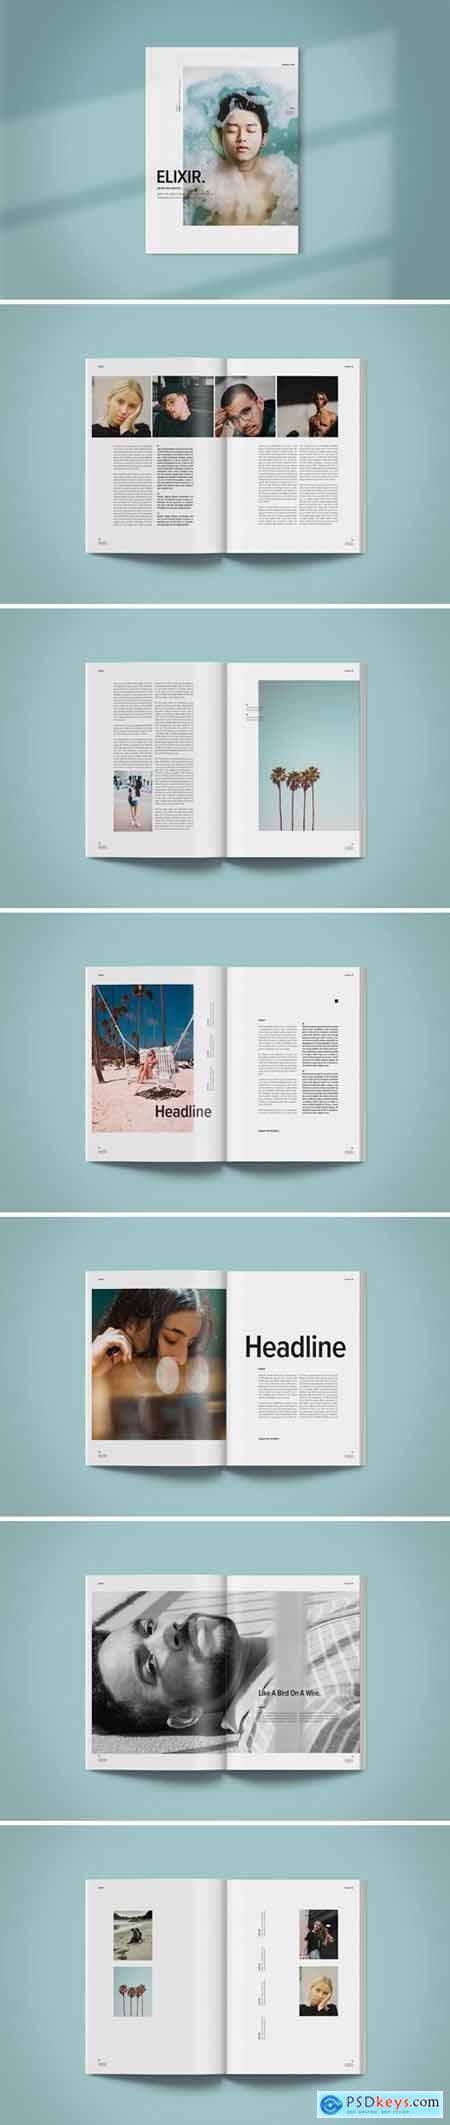 Magazine Template - Elixir